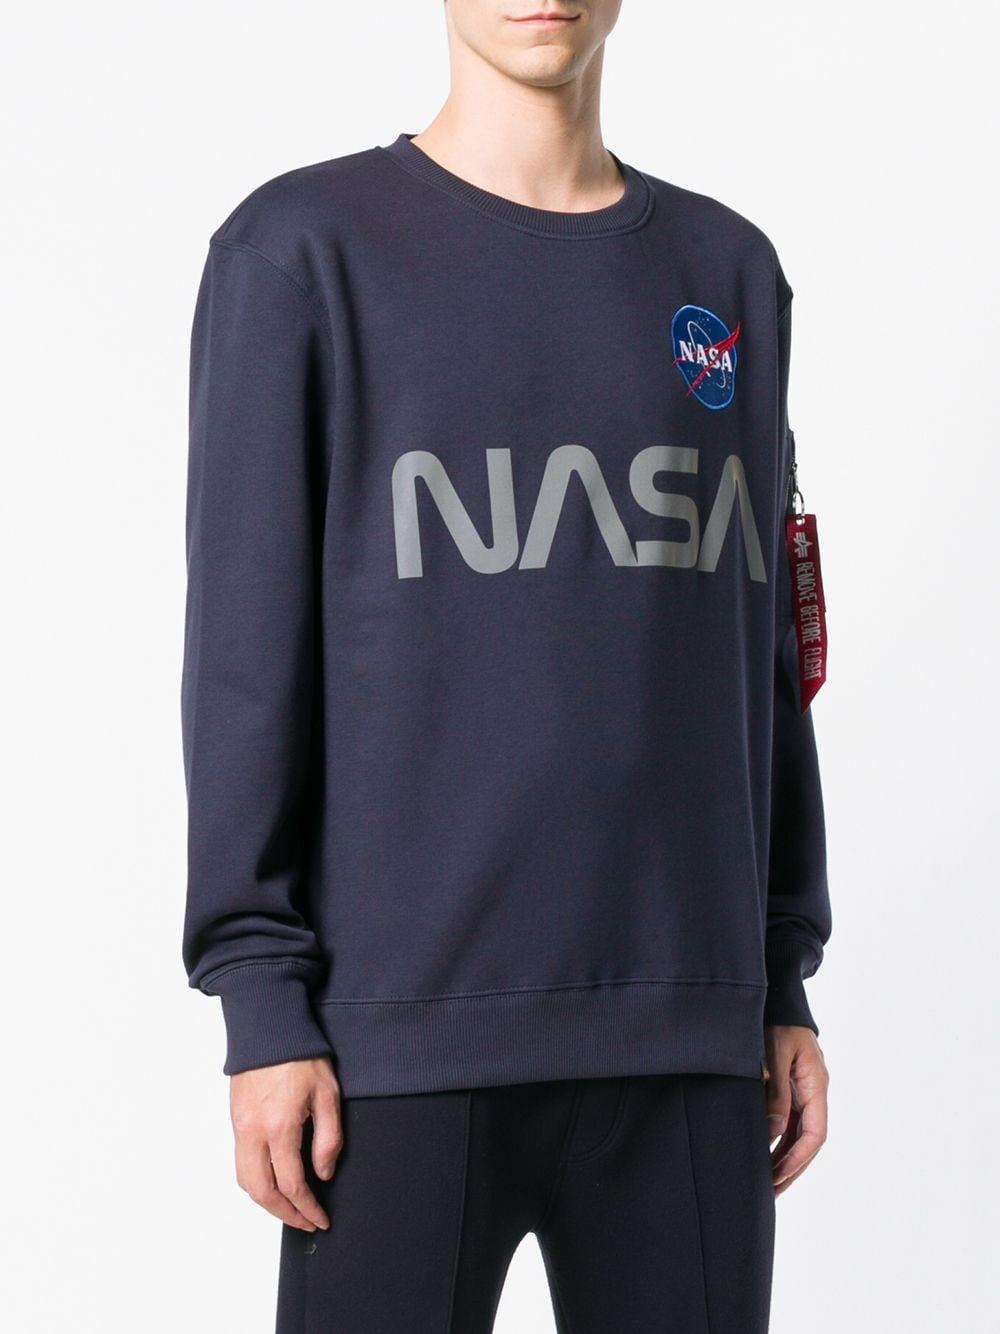 NASA REFLECTIVE CREW SWEAT ALPHA INDUSTRIES | Sweatshirts | 17830907